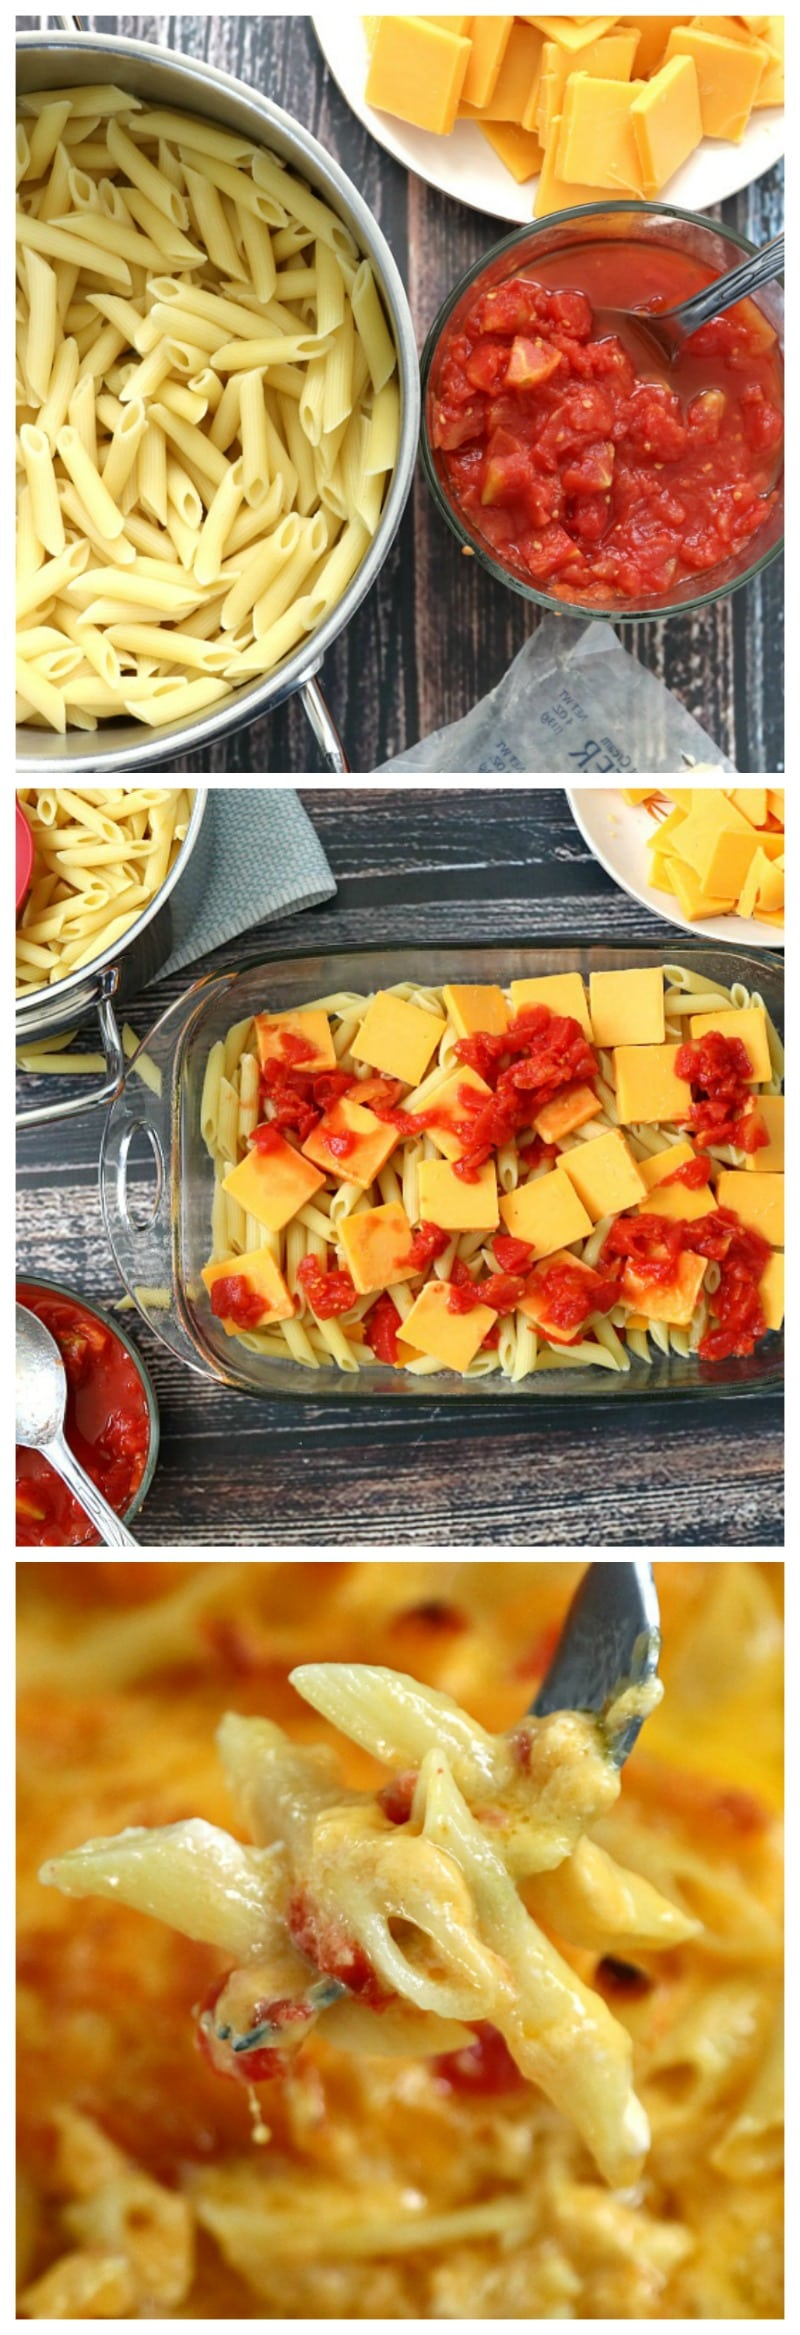 how to make homemade baked macaroni and cheese